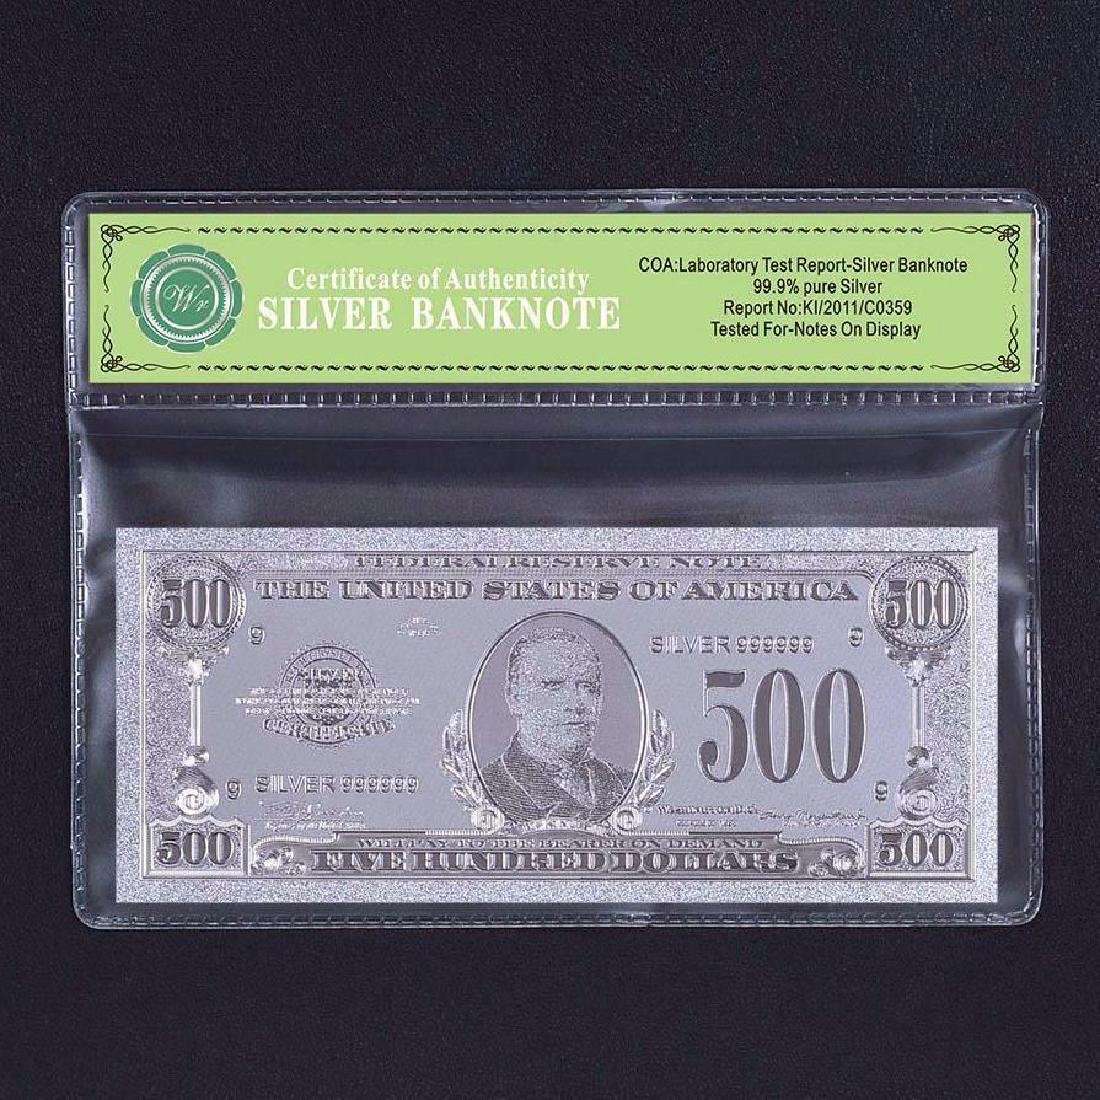 USA $500 24K Silver Clad Banknote